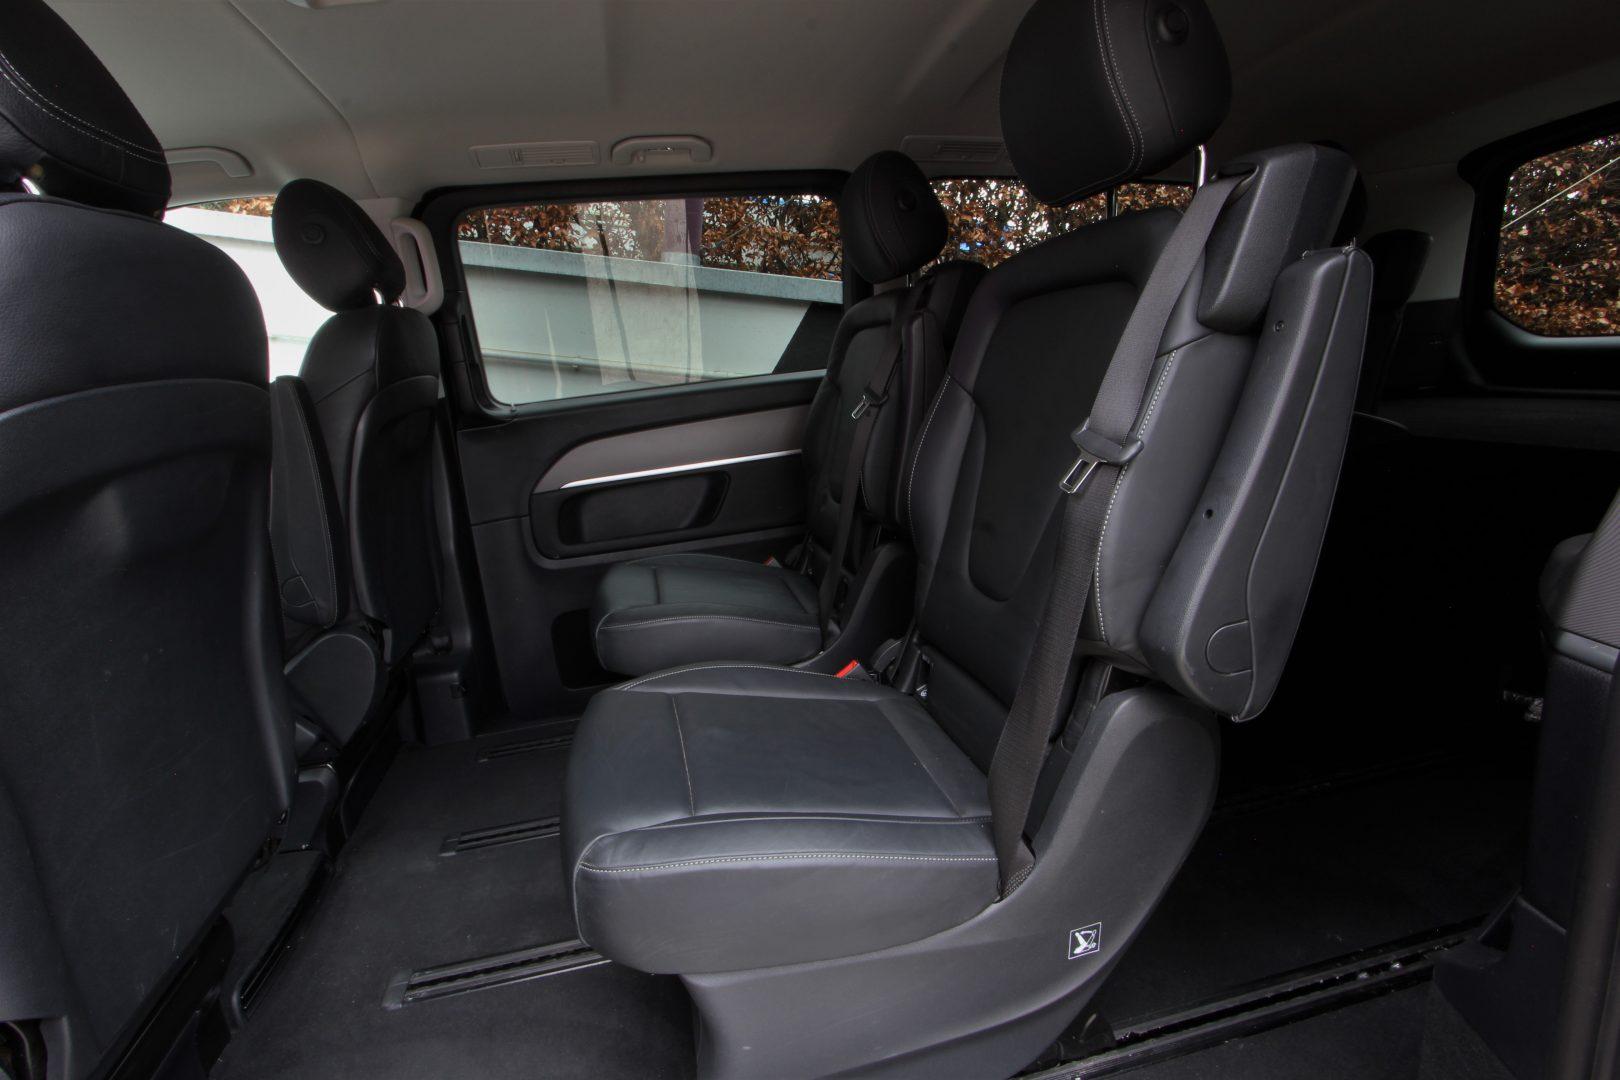 AIL Mercedes-Benz V 250 CDI/BT/d AVANTGARD LED  1